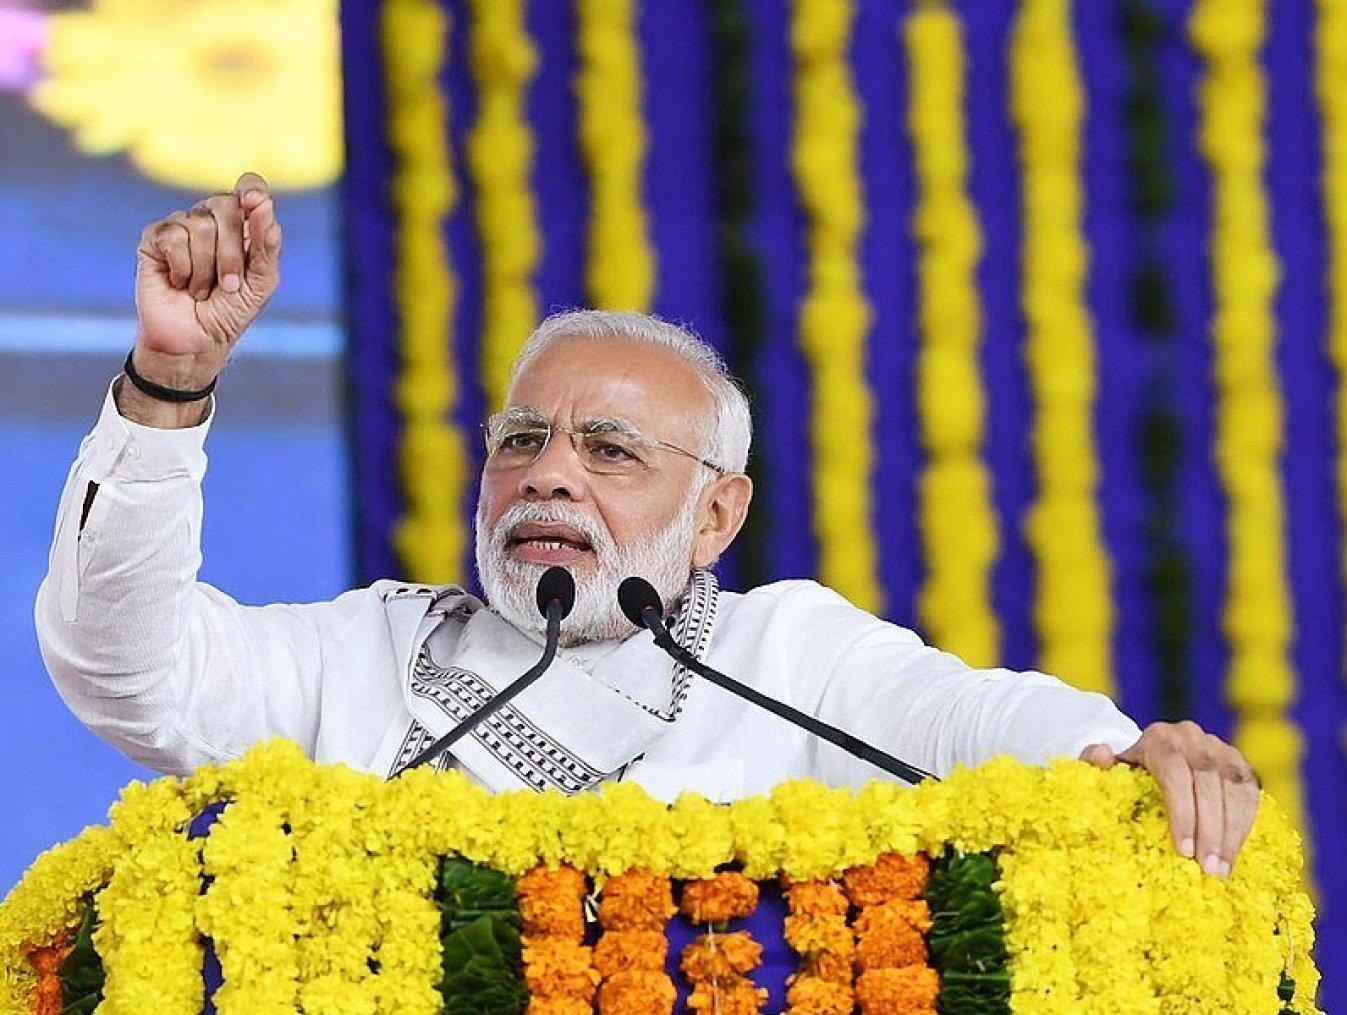 The Prime Minister, Shri Narendra Modi addressing a public meeting, in Junagadh district, Gujarat on August 23, 2018.